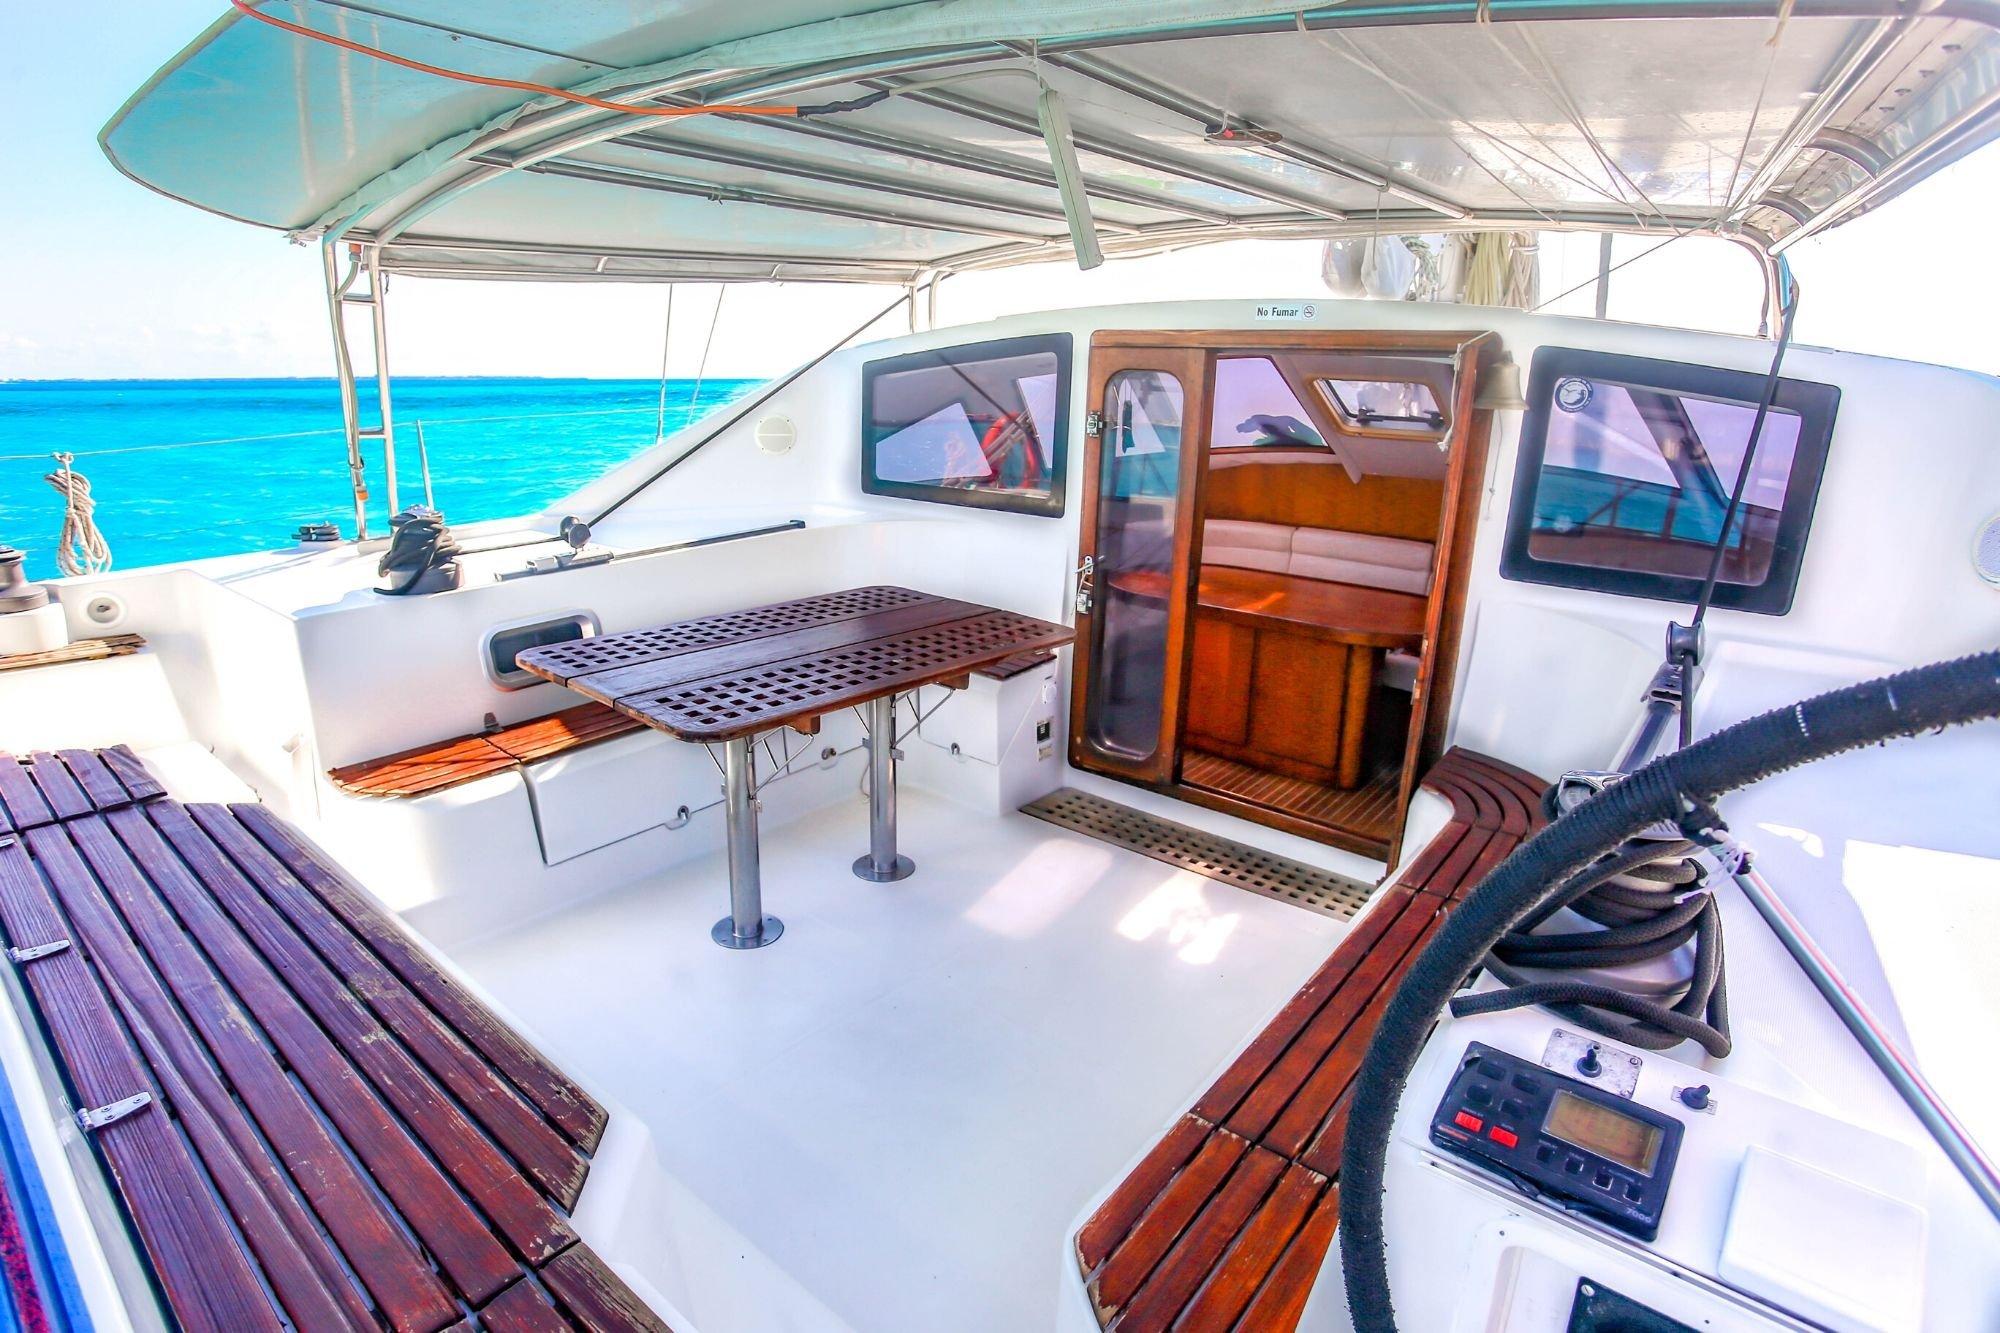 Arjuna - Isla Mujeres Catamaran Tour - Cancun Sailing - 5